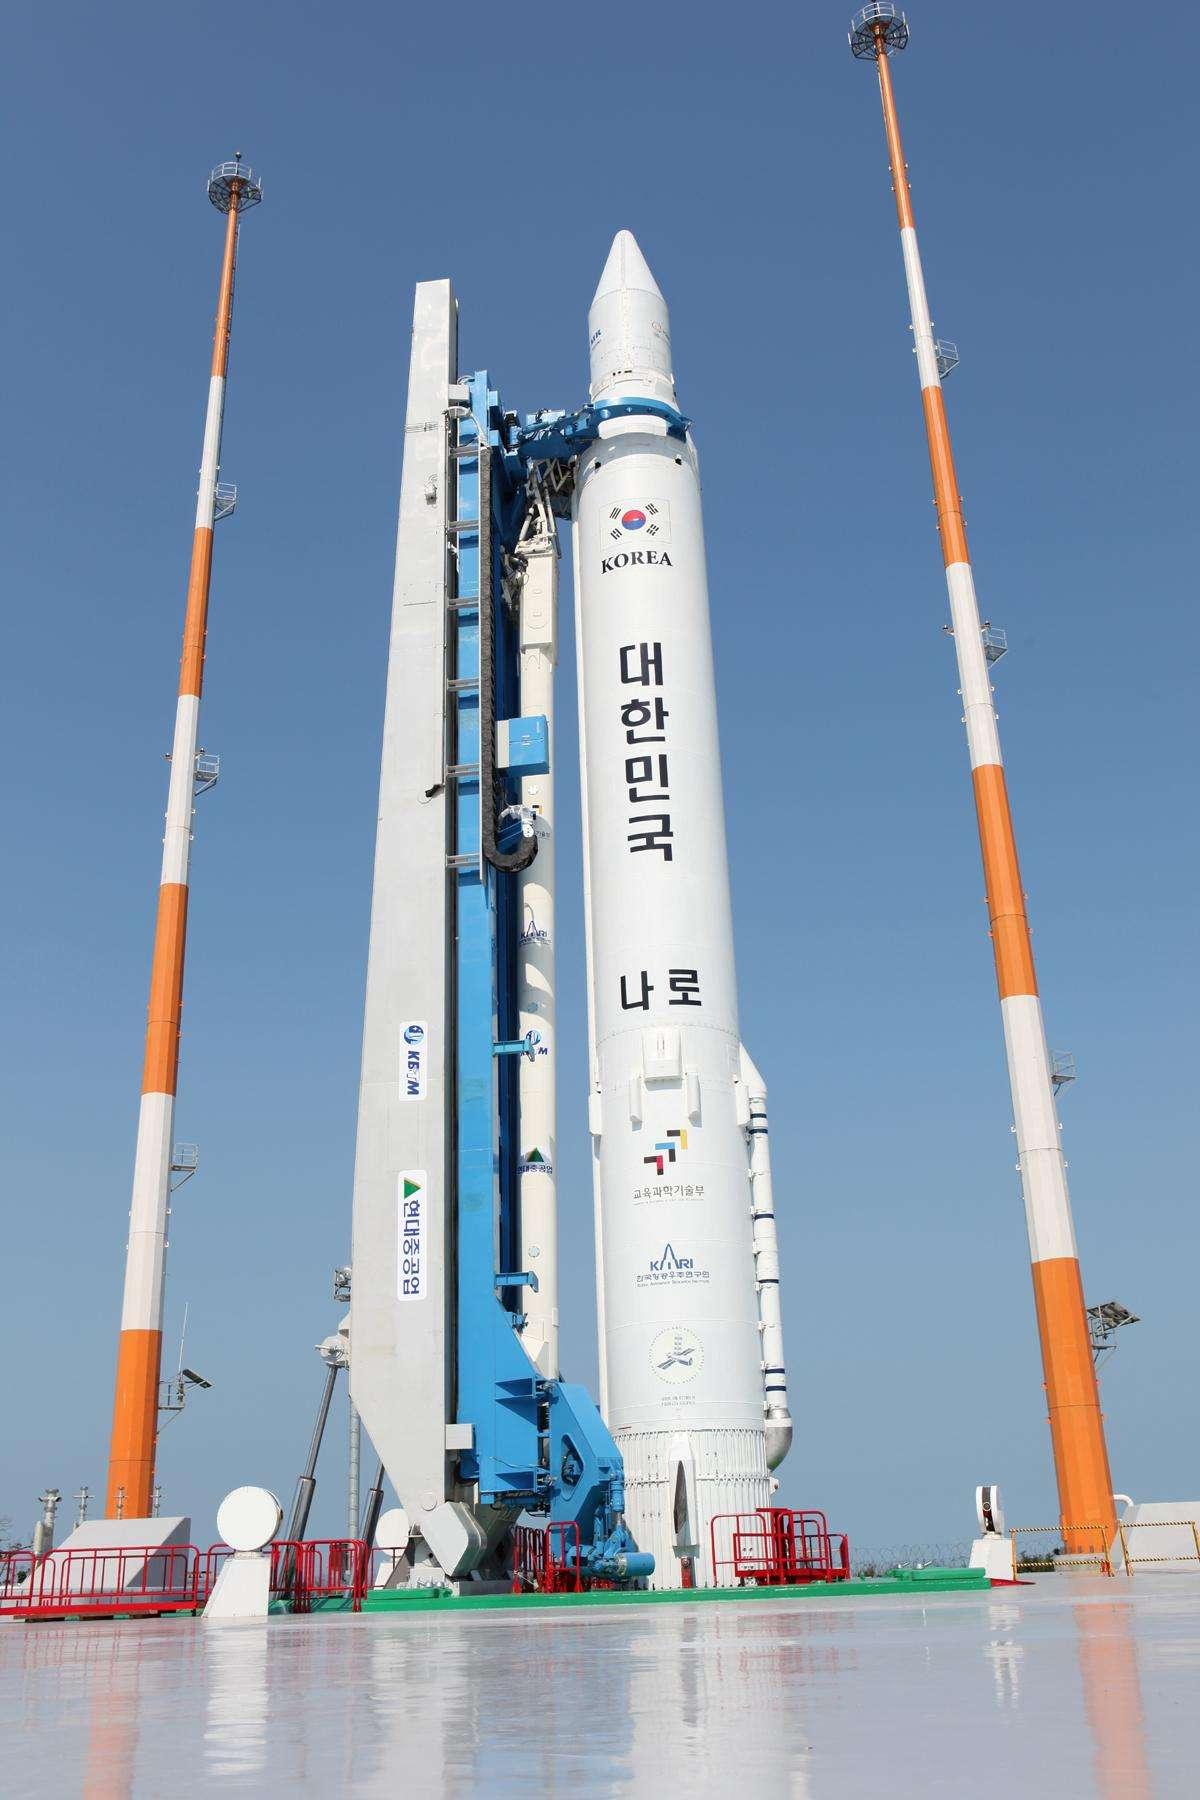 La fusée KSLV-1 (ou Naro-1) sur son pas de tir en août 2009. © Kari